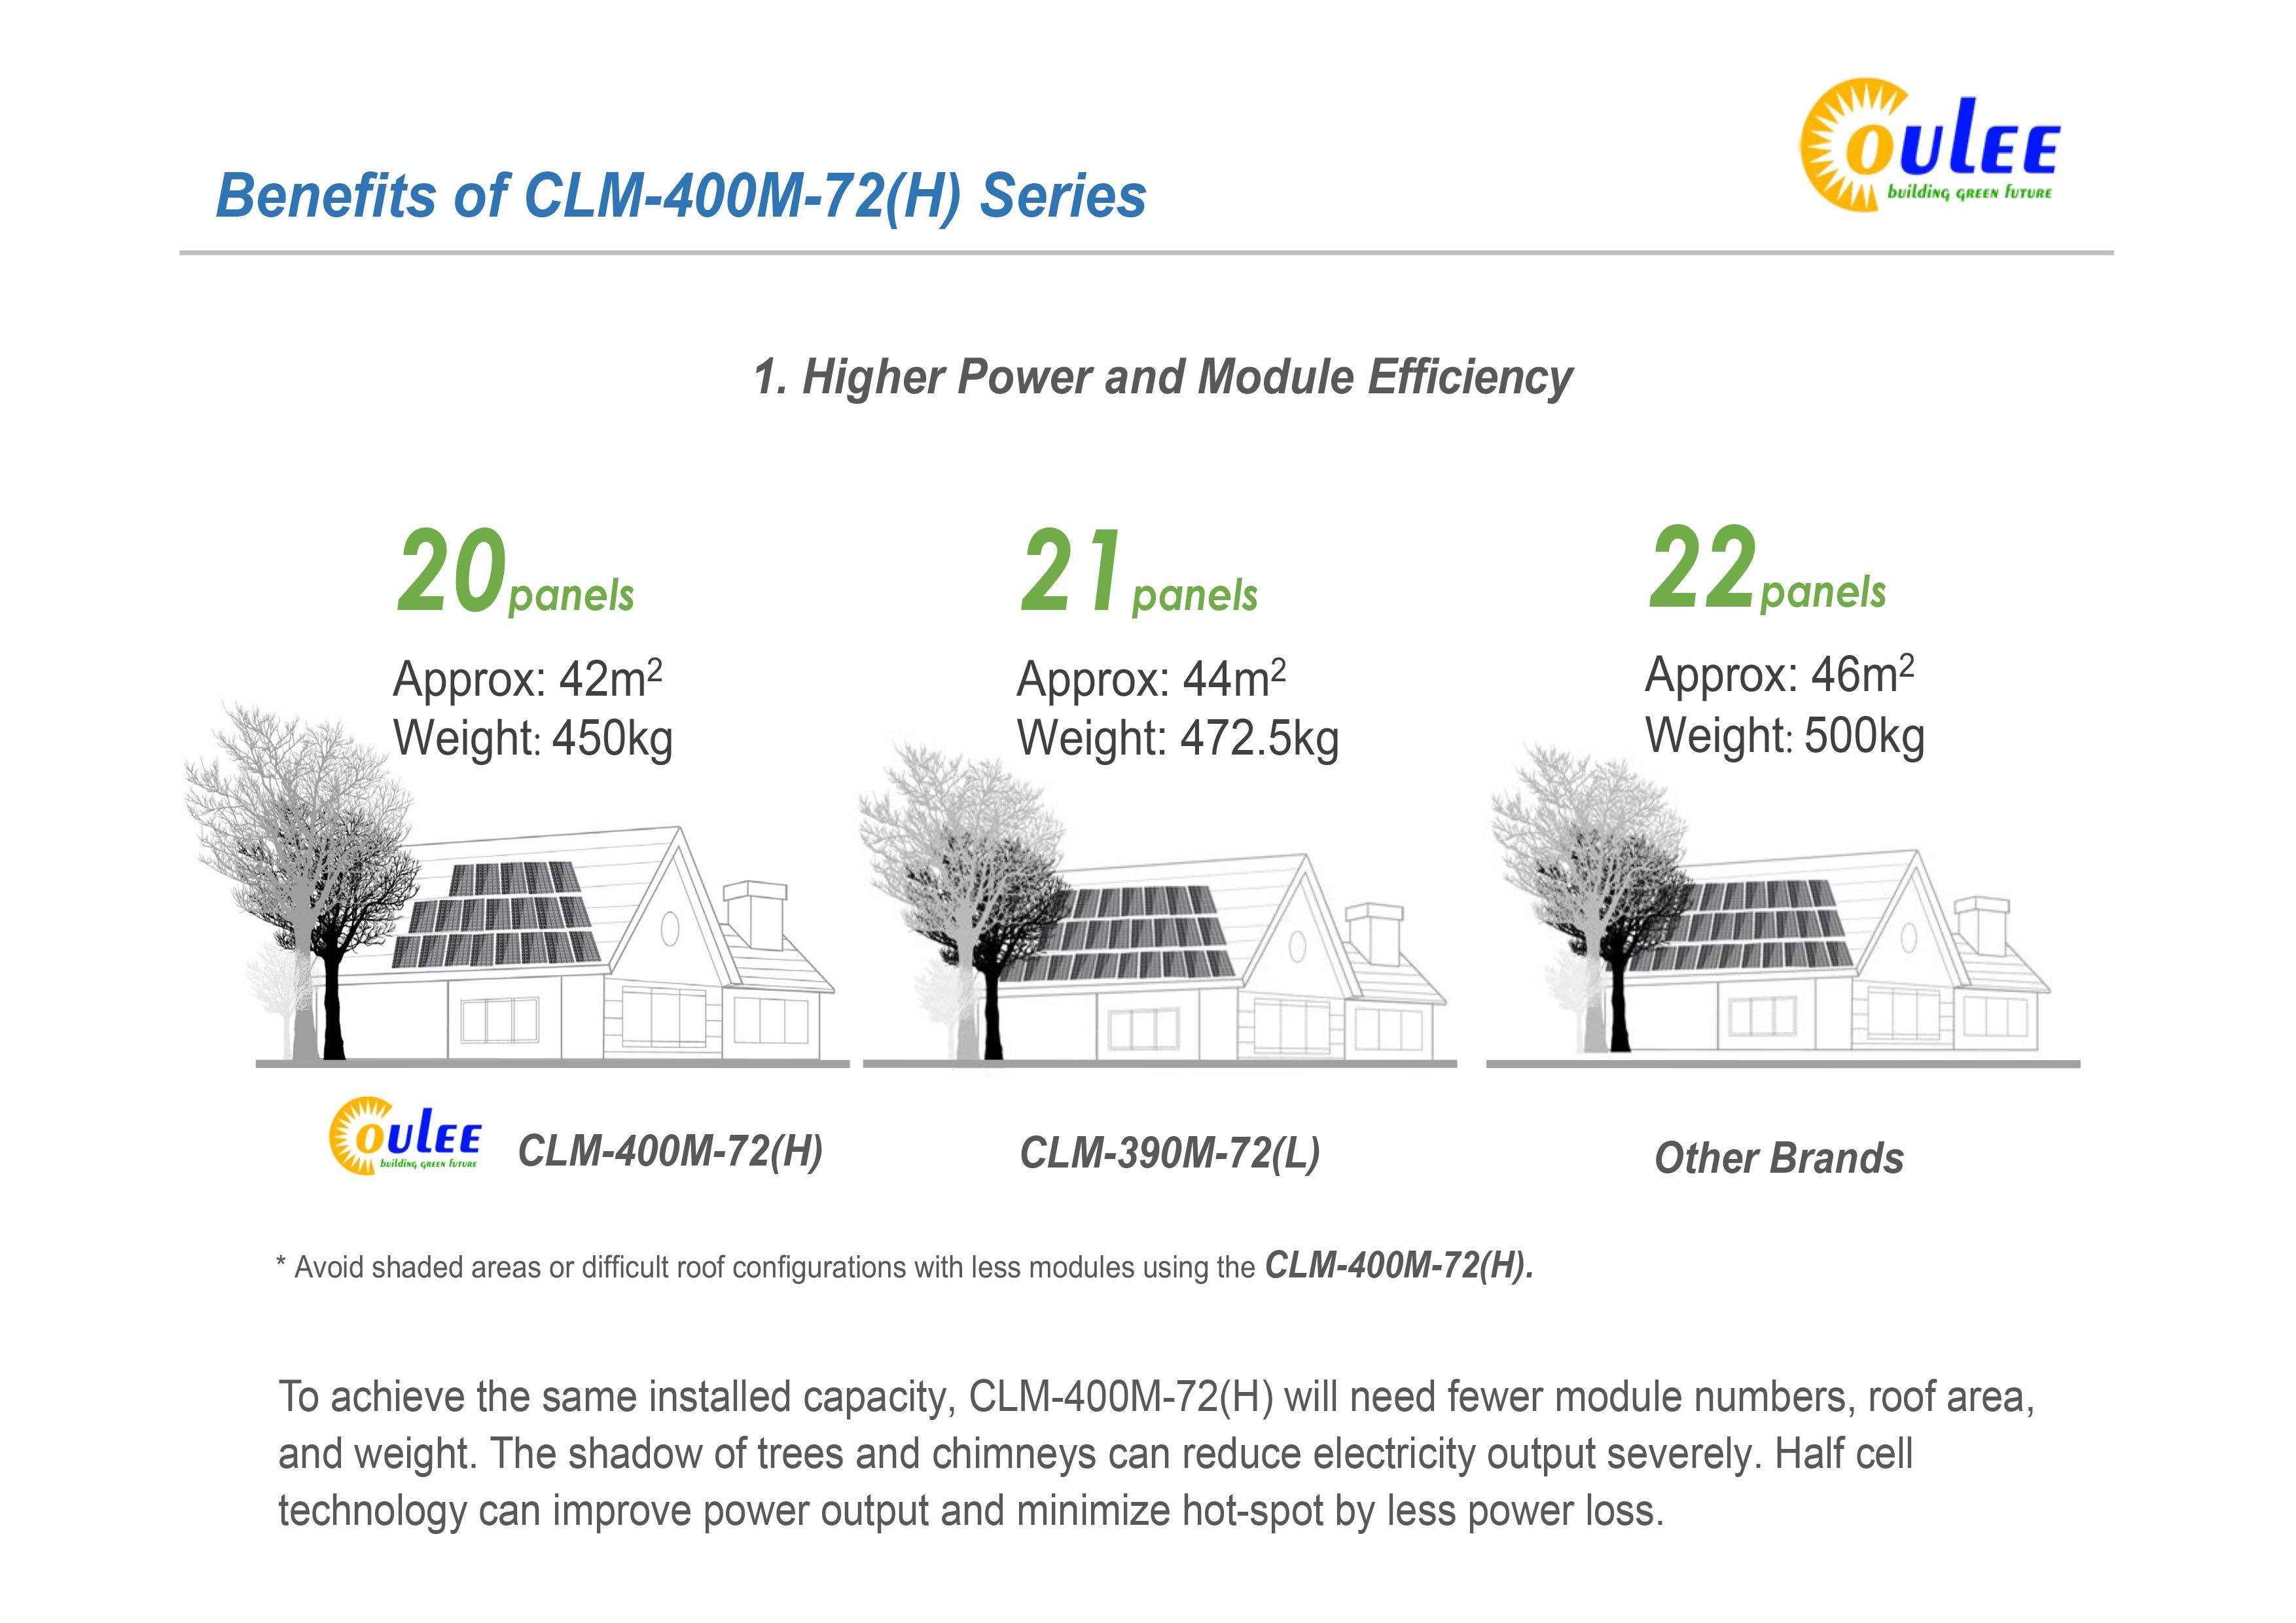 dual cell solar panels, mono perc half cell